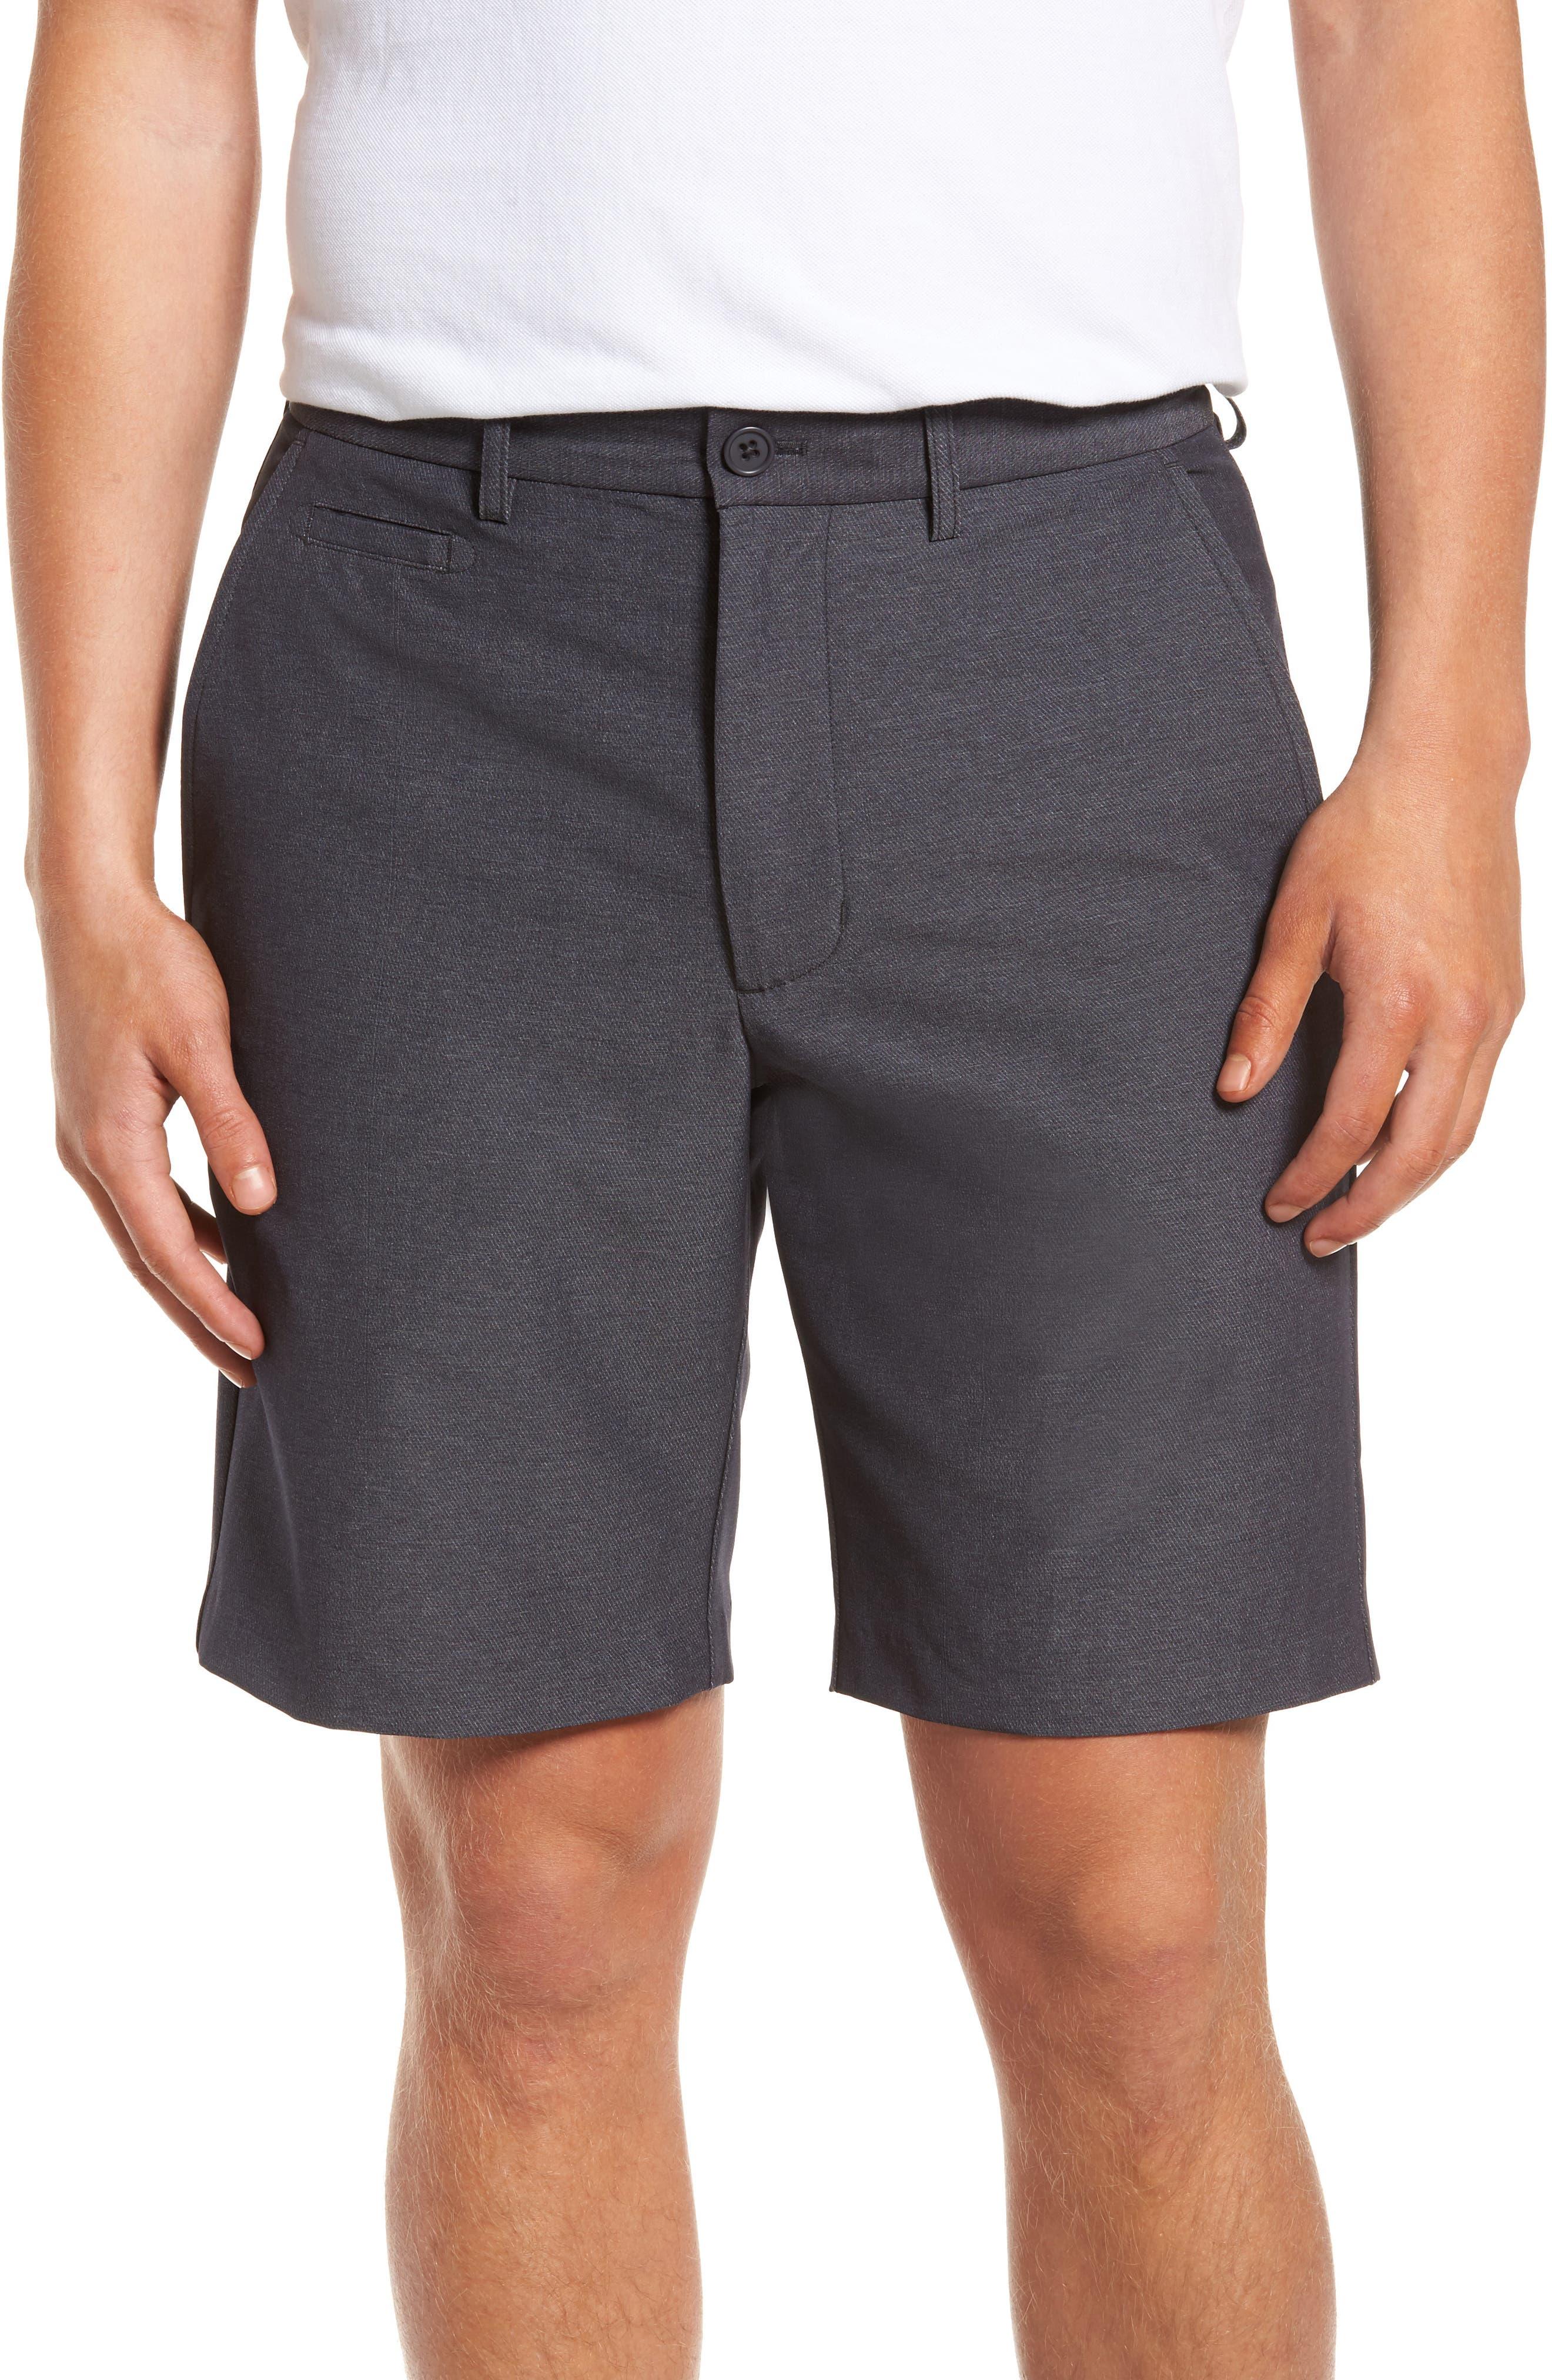 Performance Chino Shorts,                         Main,                         color, Grey Onyx Heather